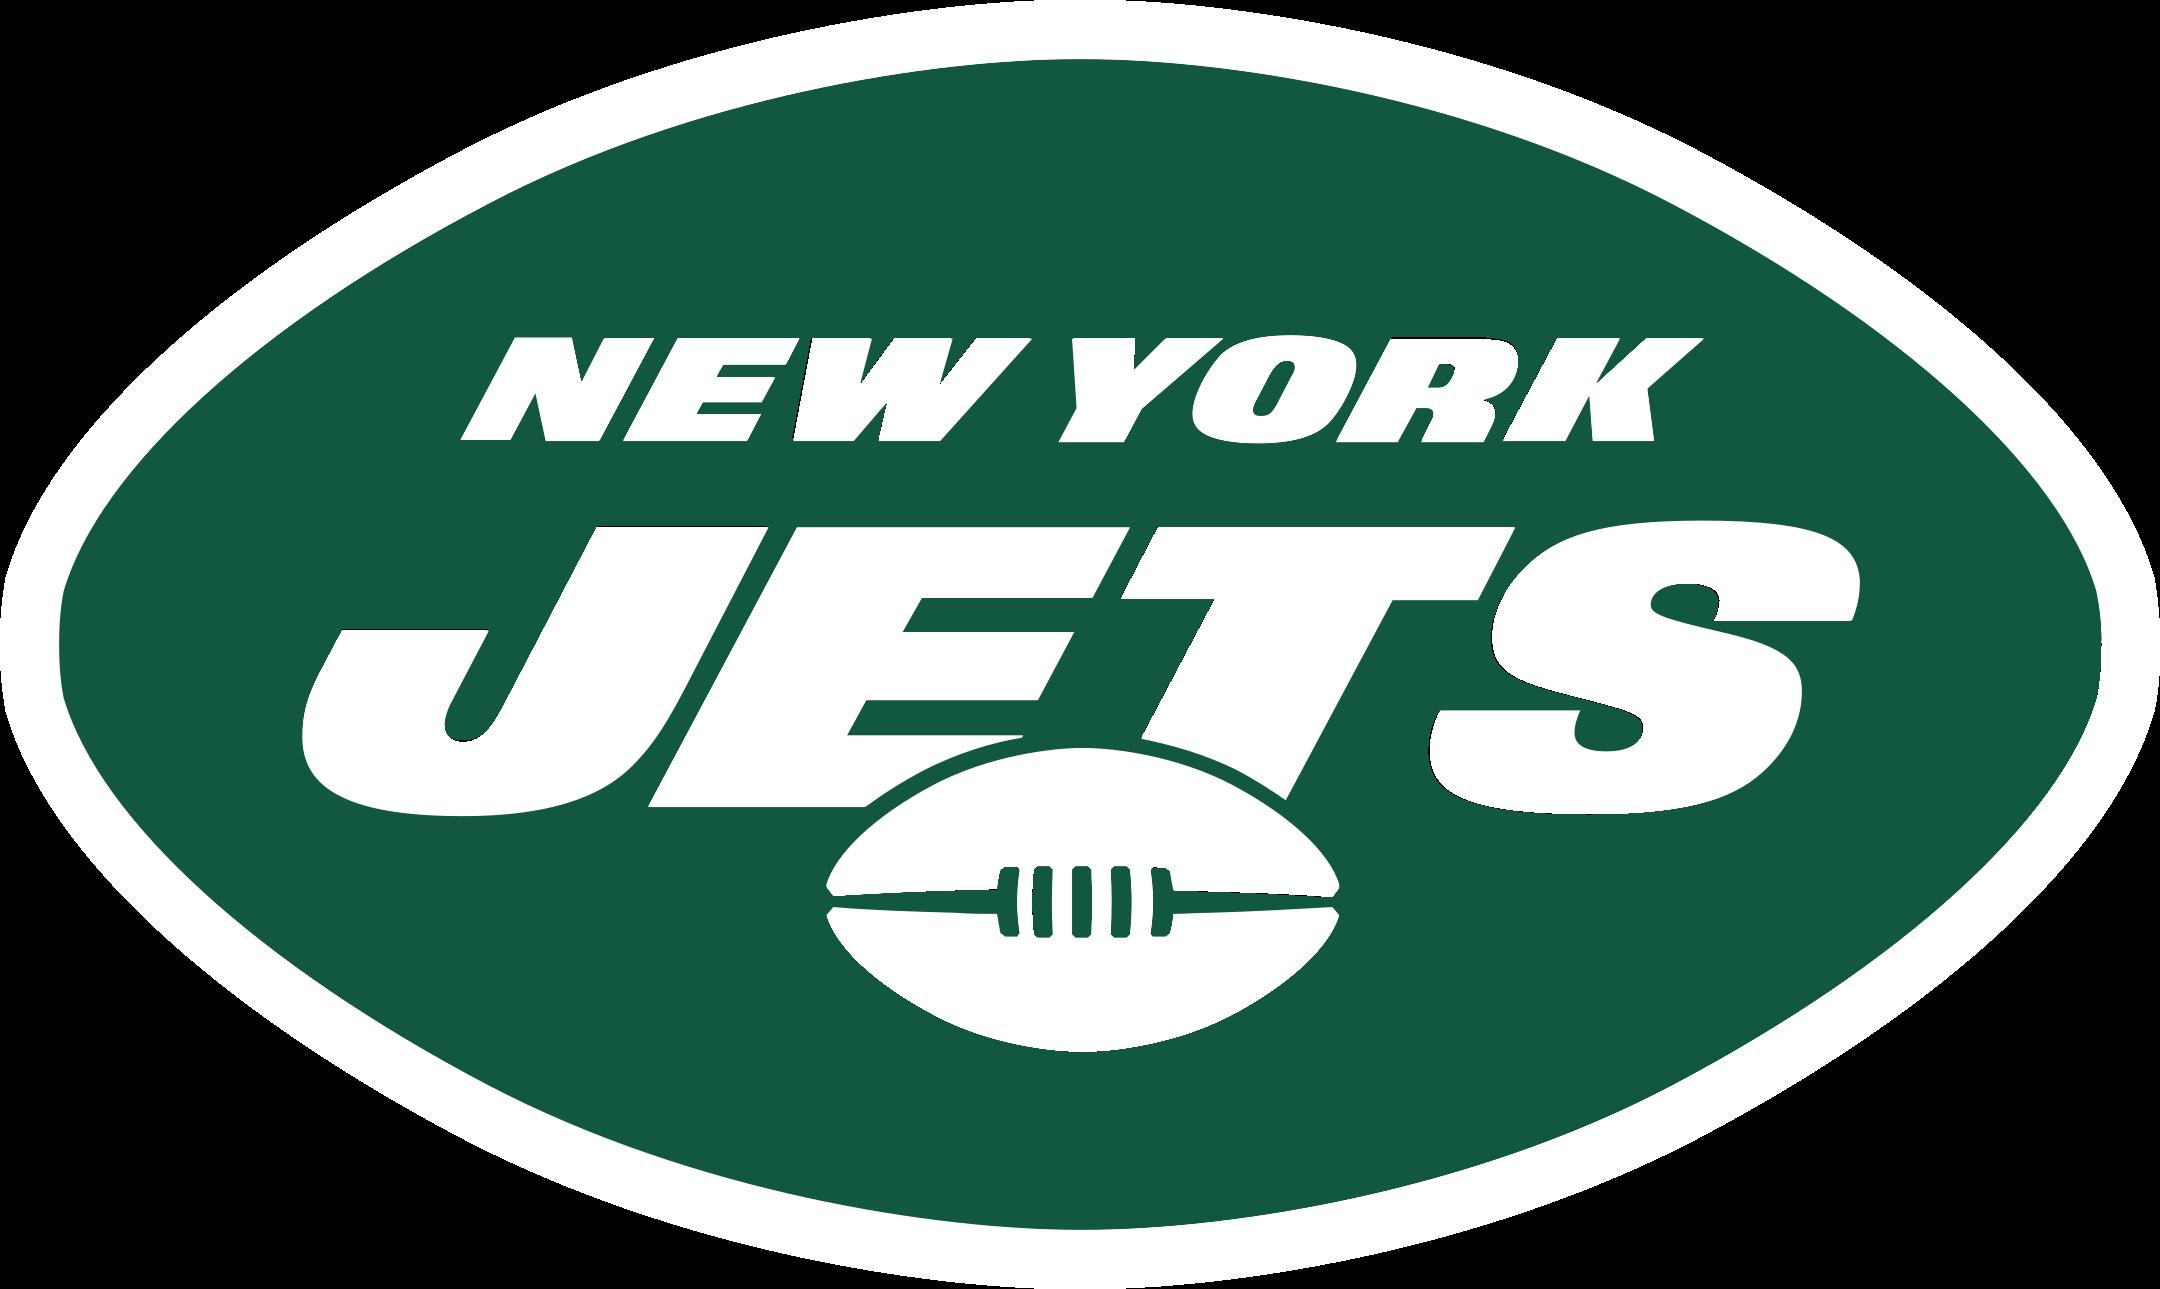 new york jets logo 1 - New York Jets Logo